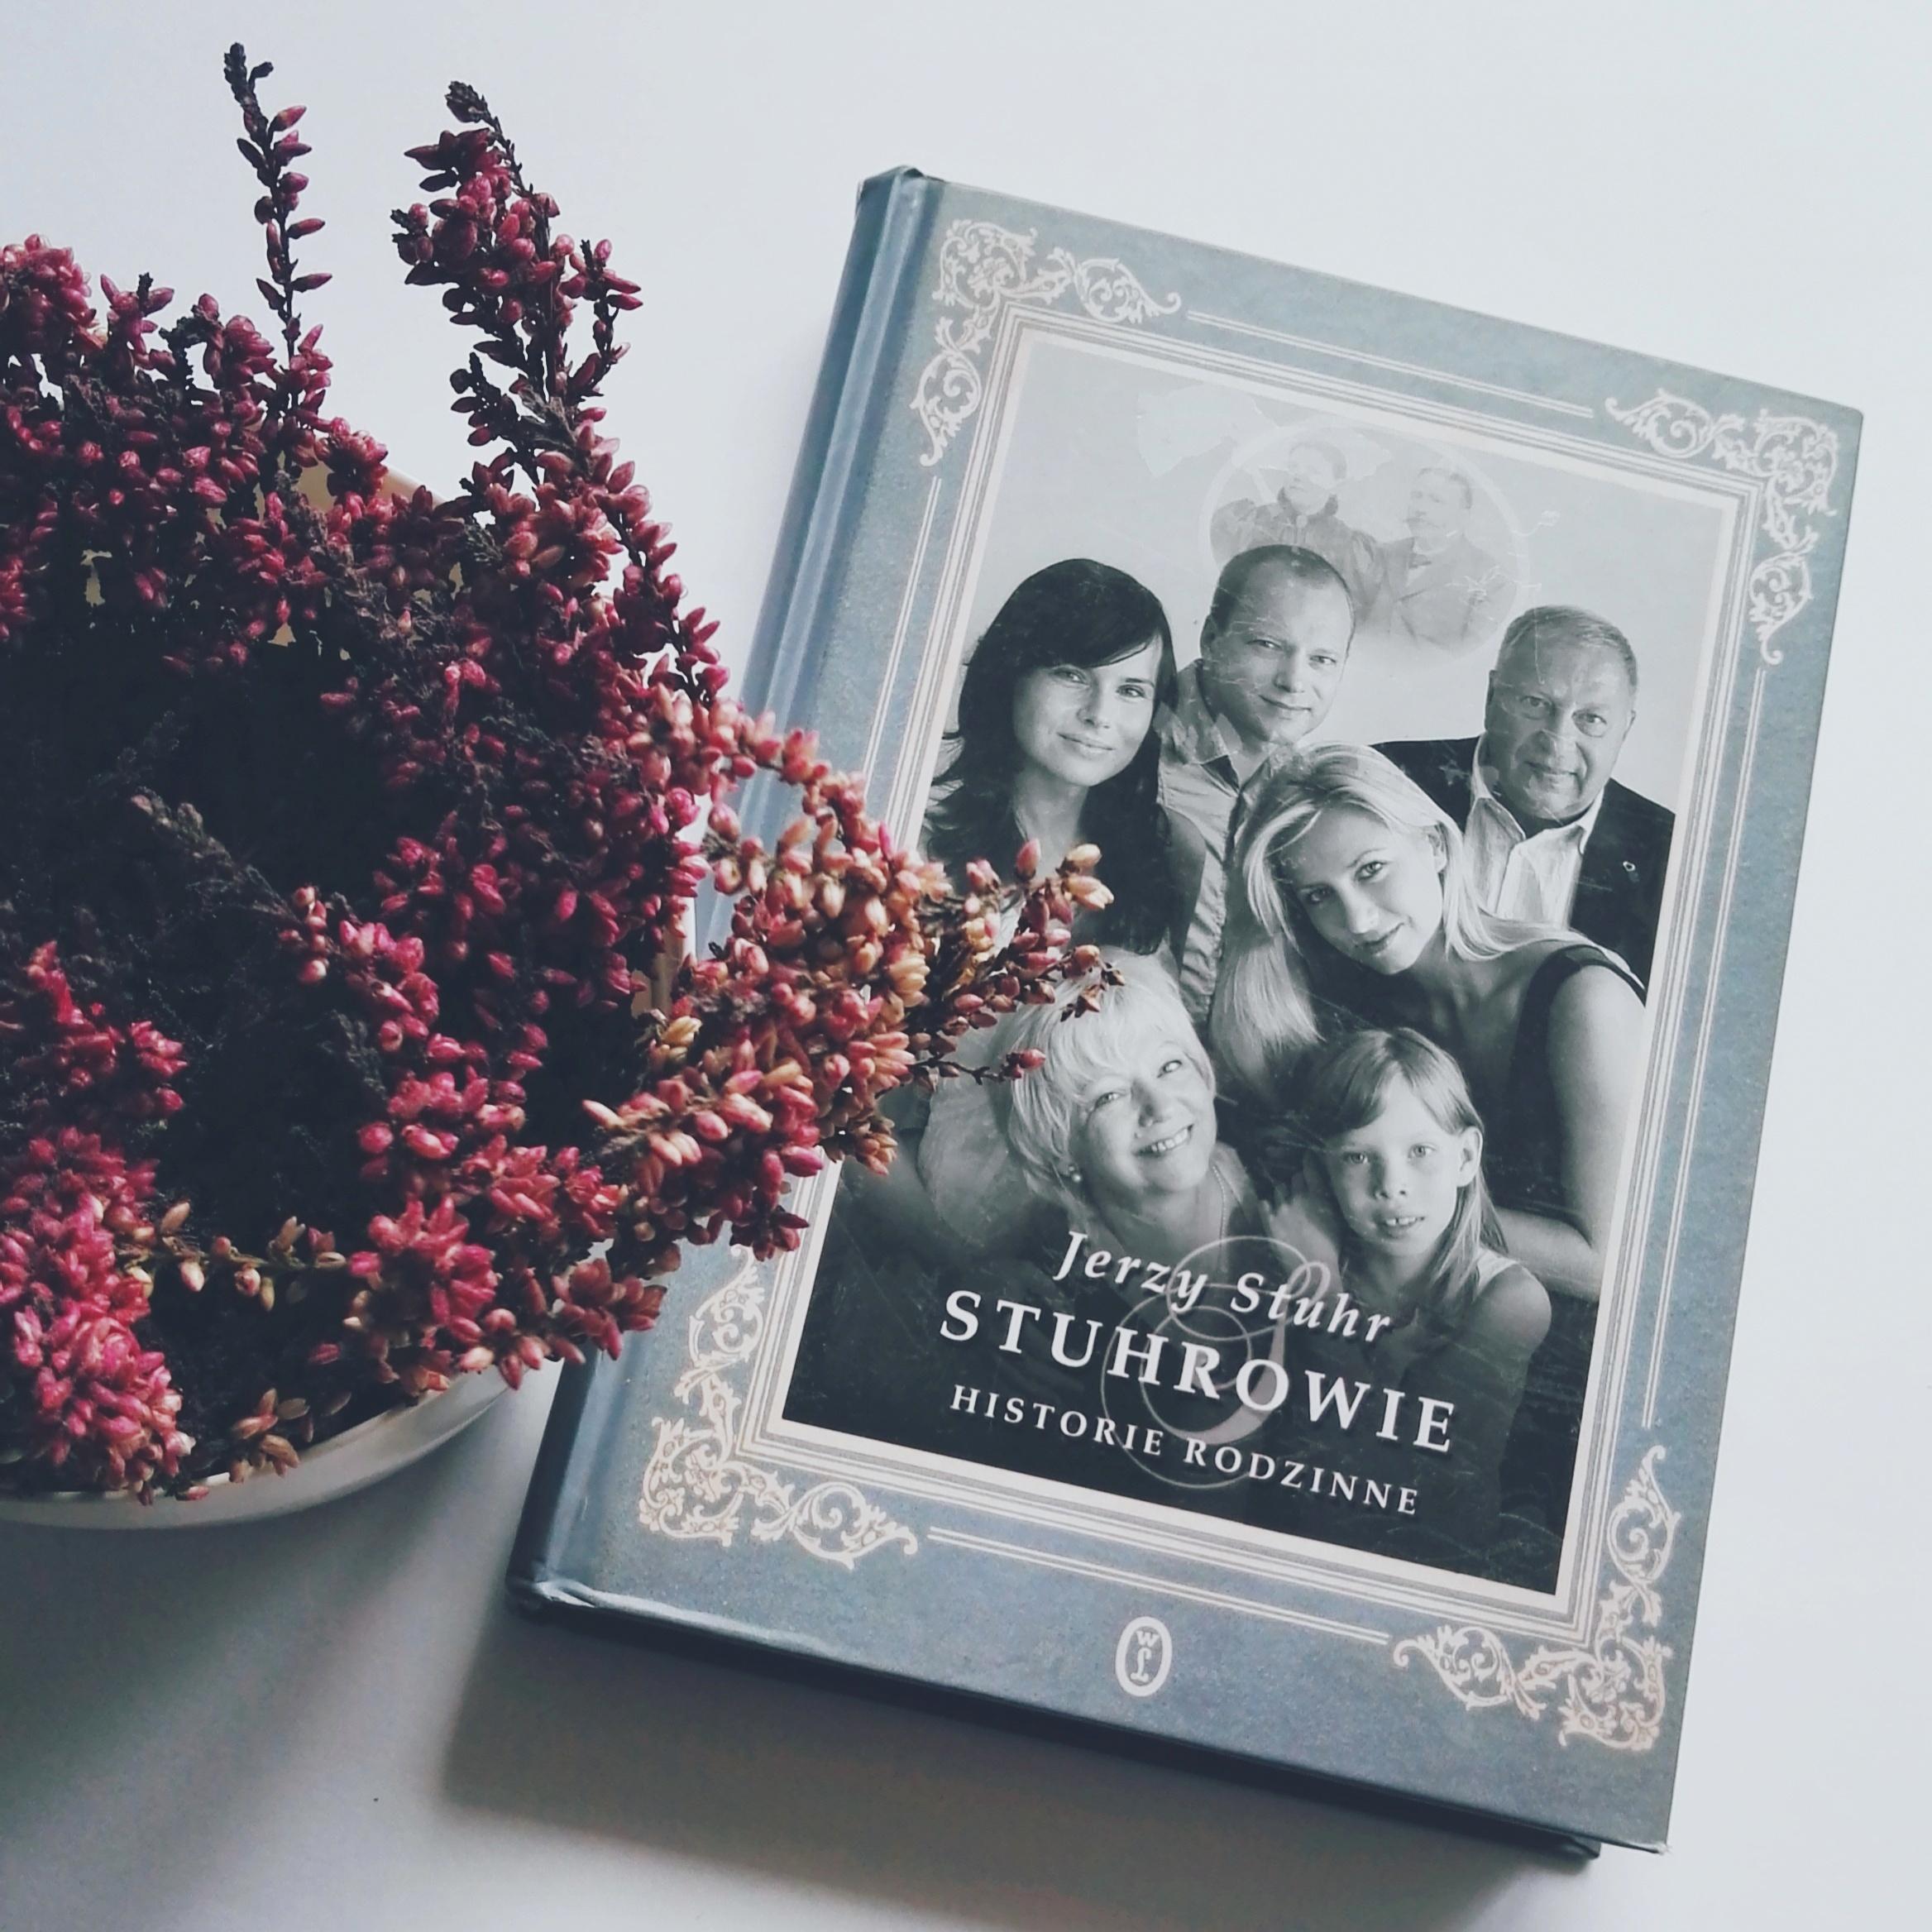 historie rodzinne